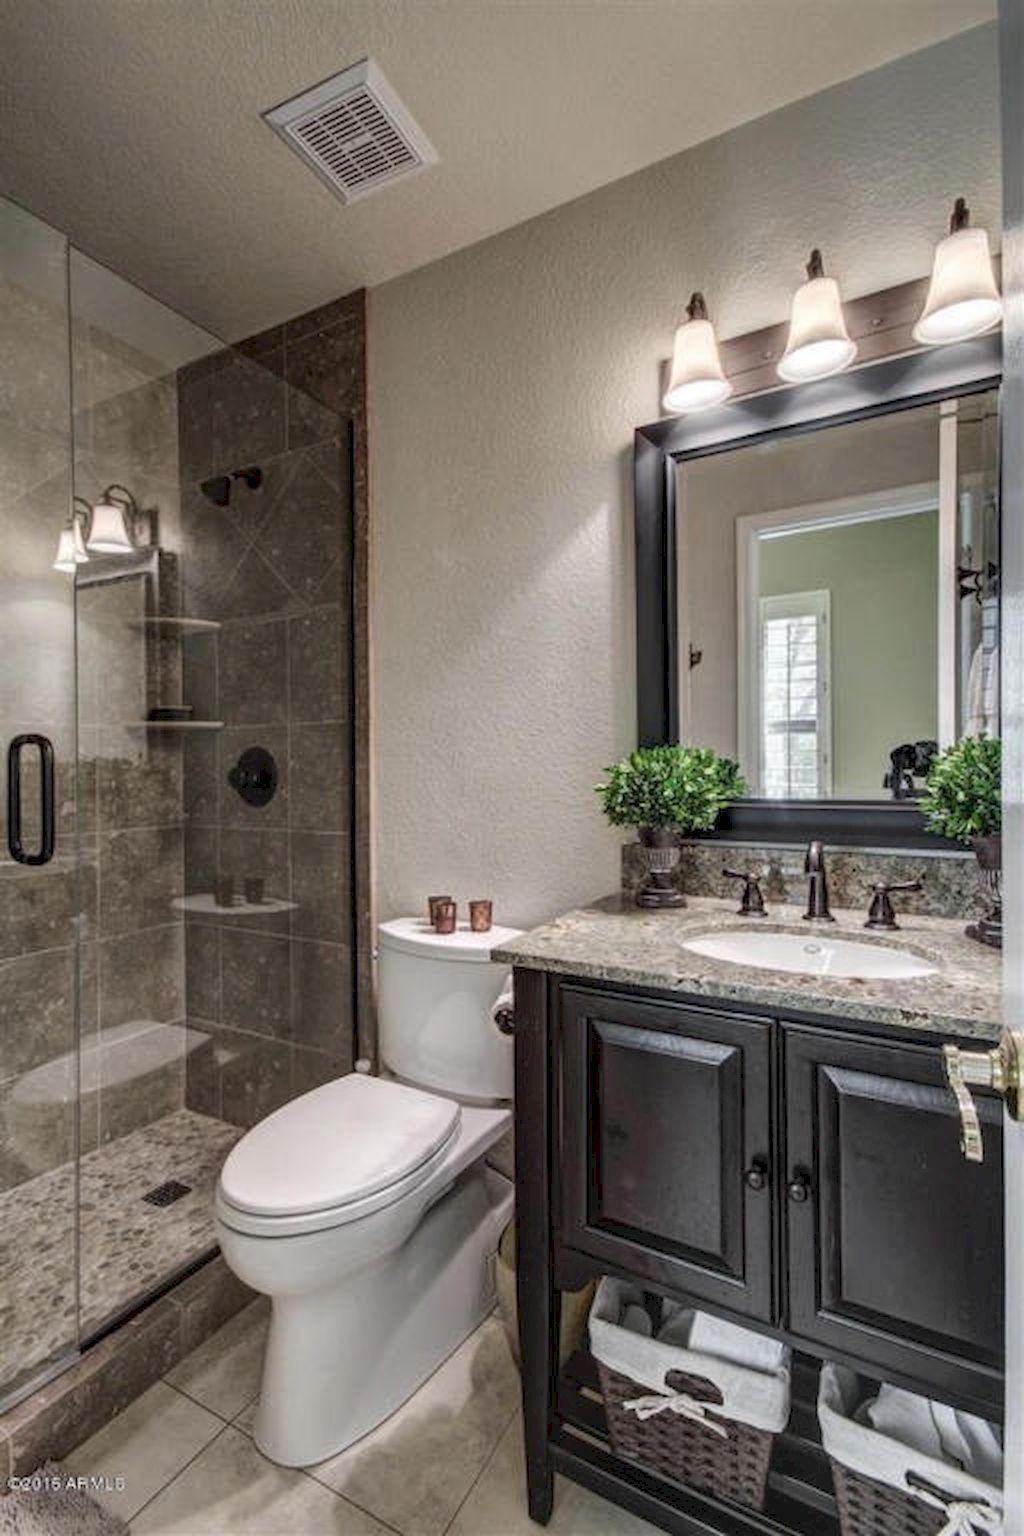 15+ Small White Beautiful Bathroom Remodel Ideas